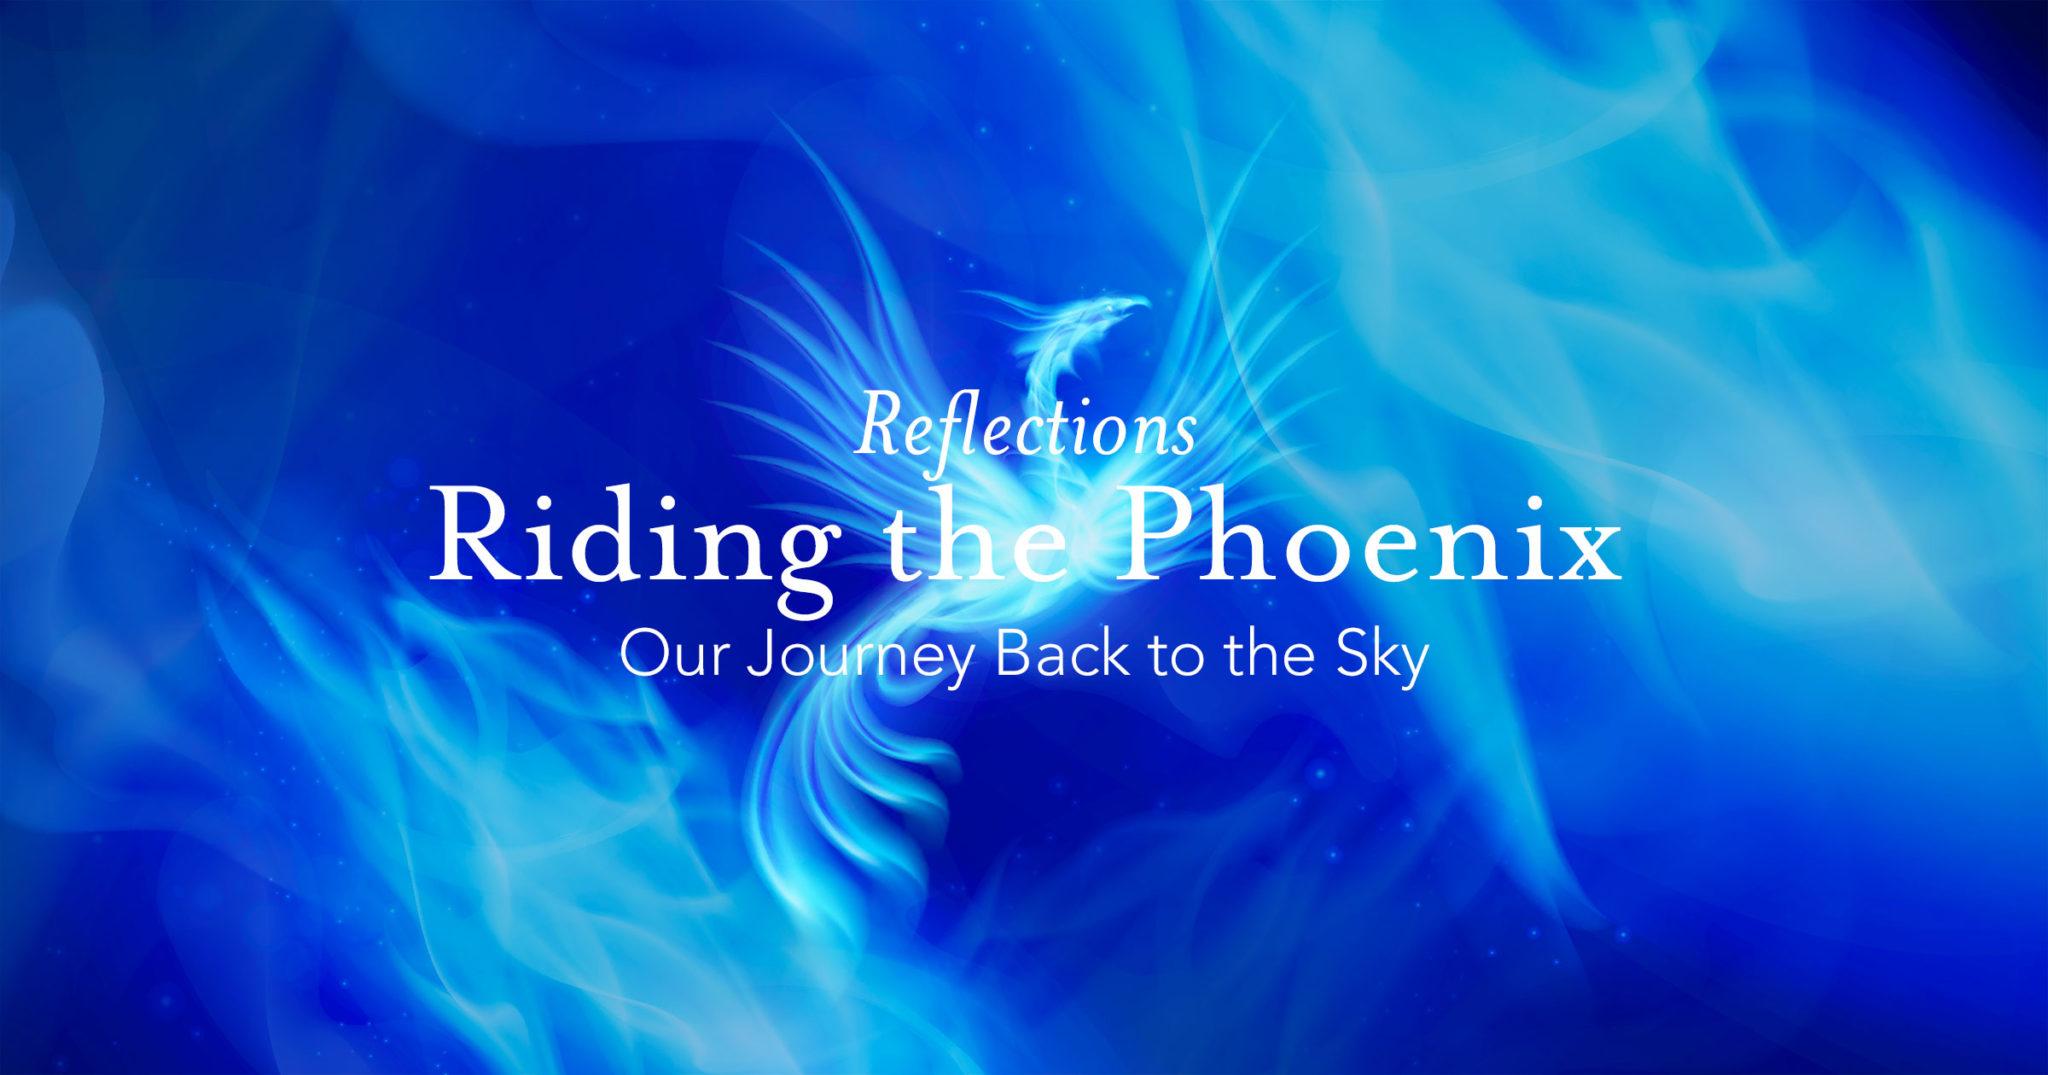 Reflections: Riding the Phoenix